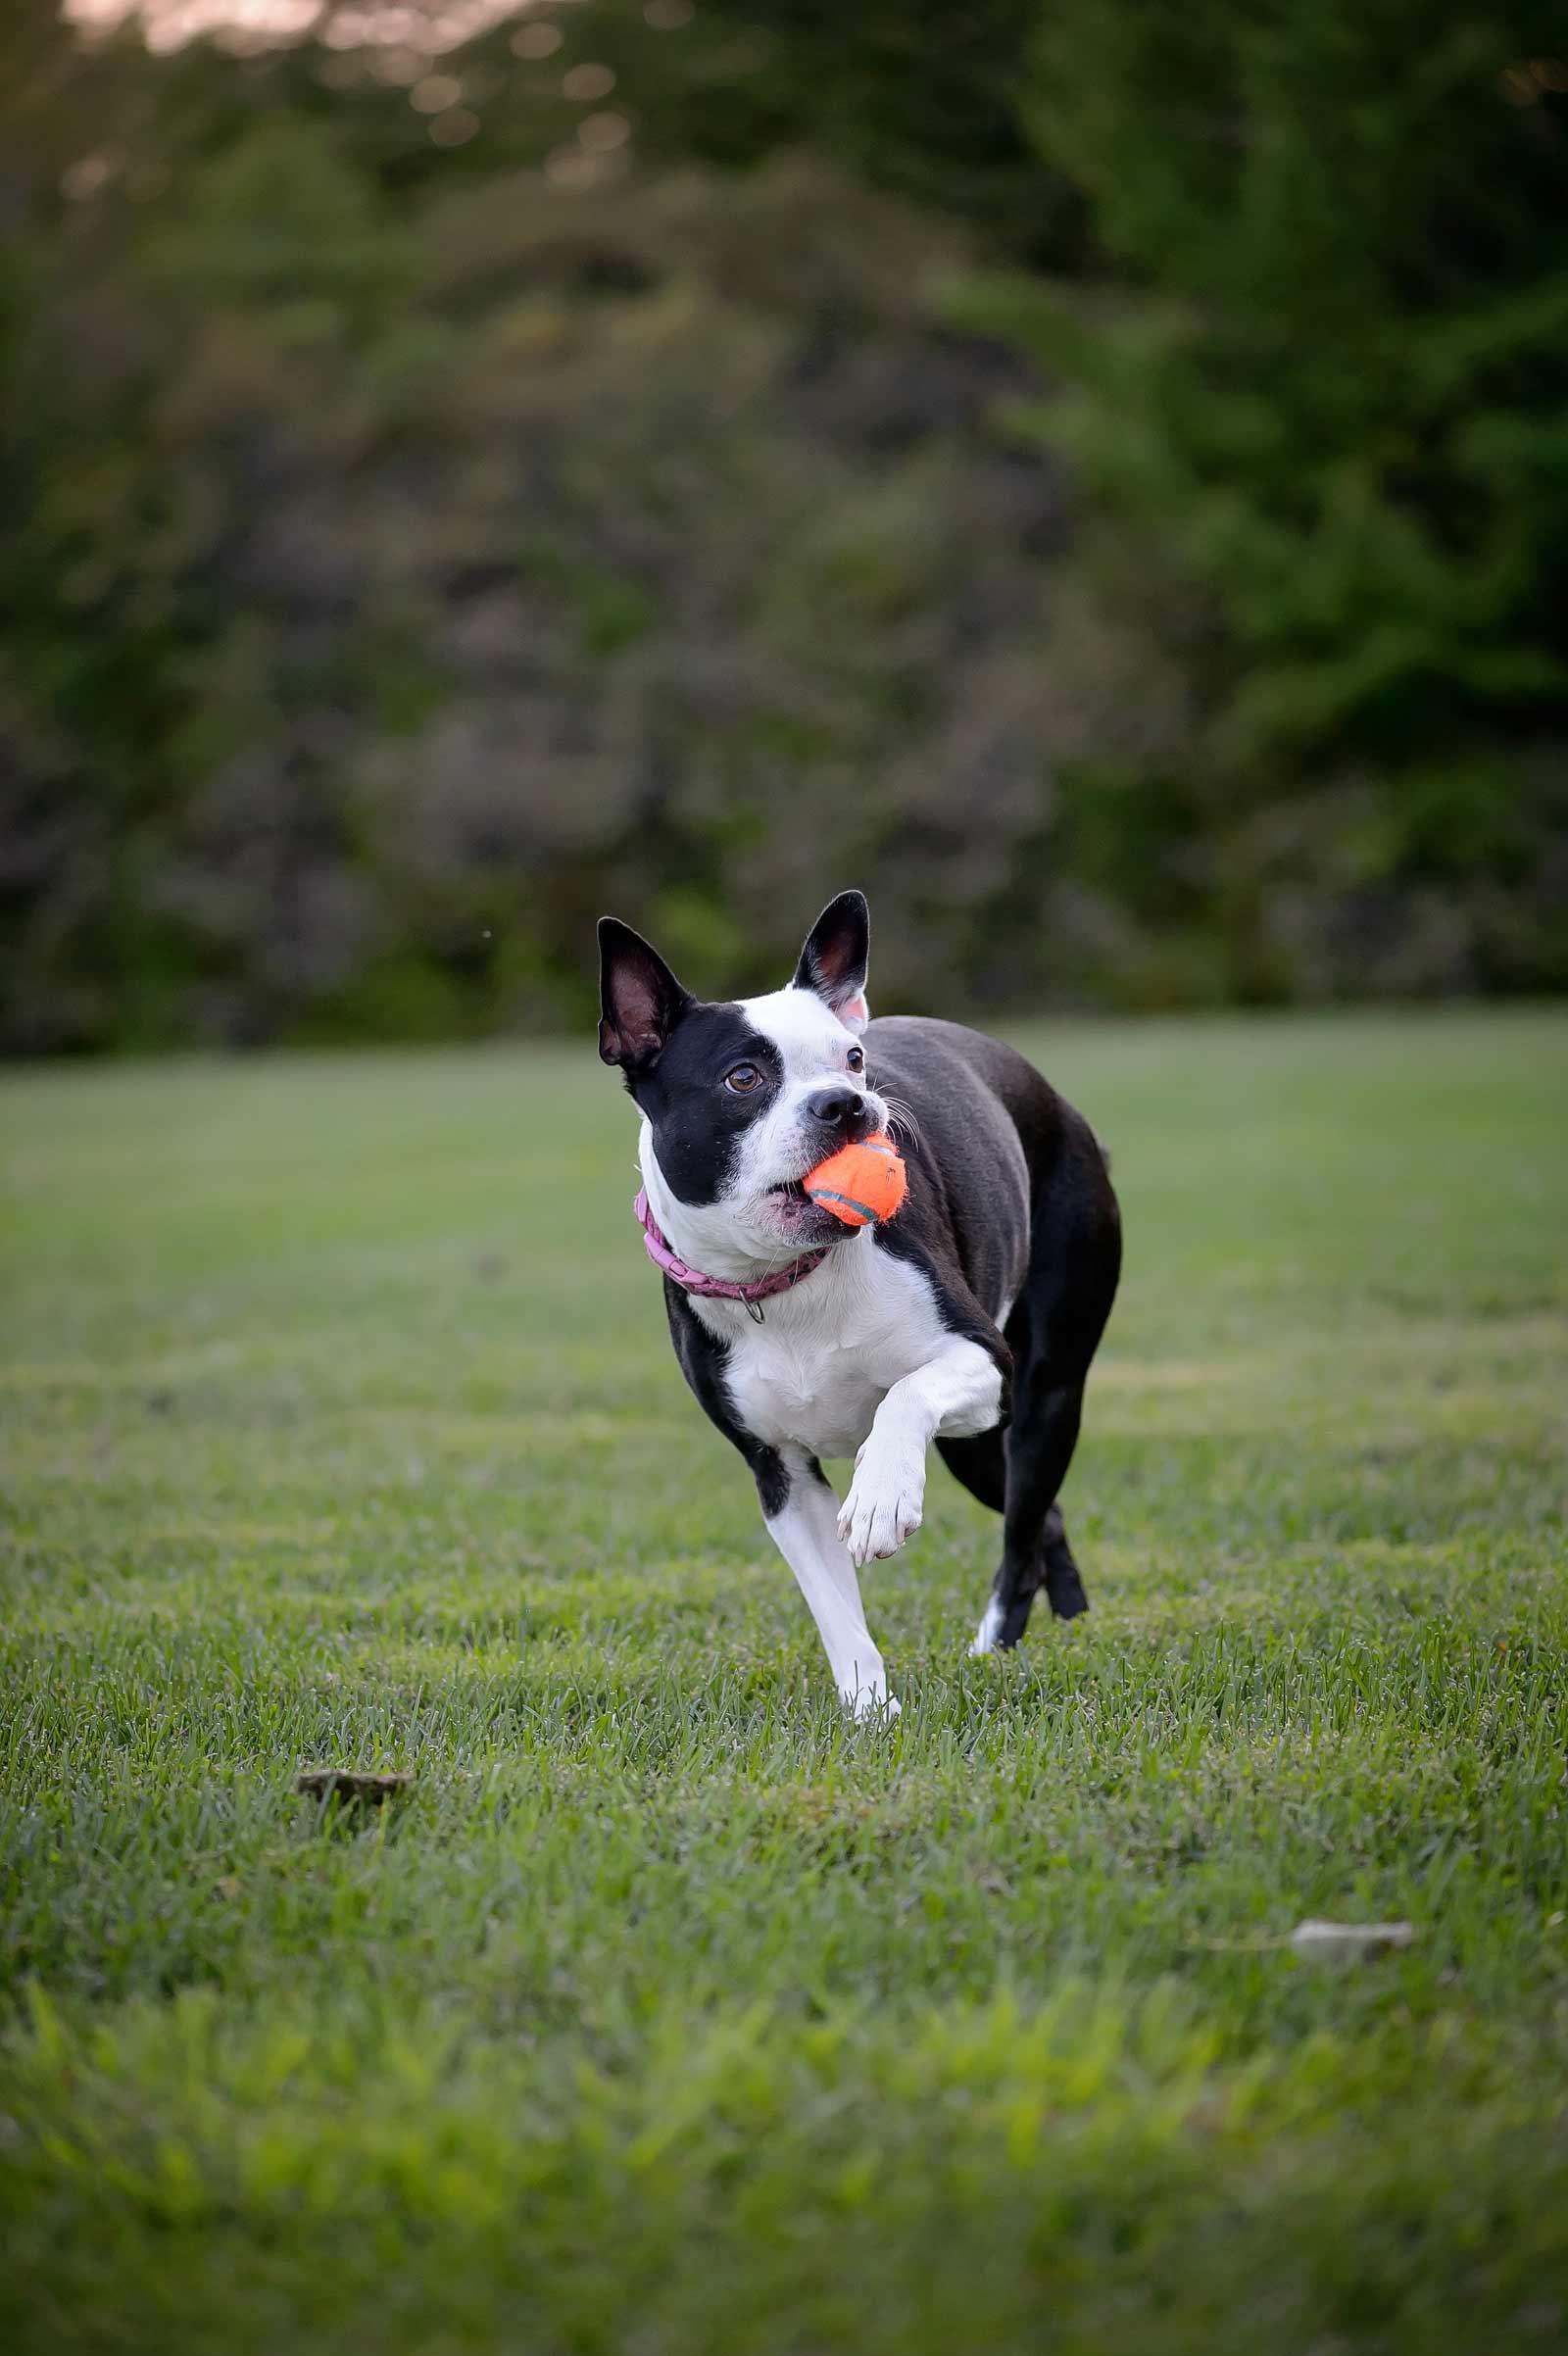 Henry-Chloe-boston-terriers-sneakpeek-08